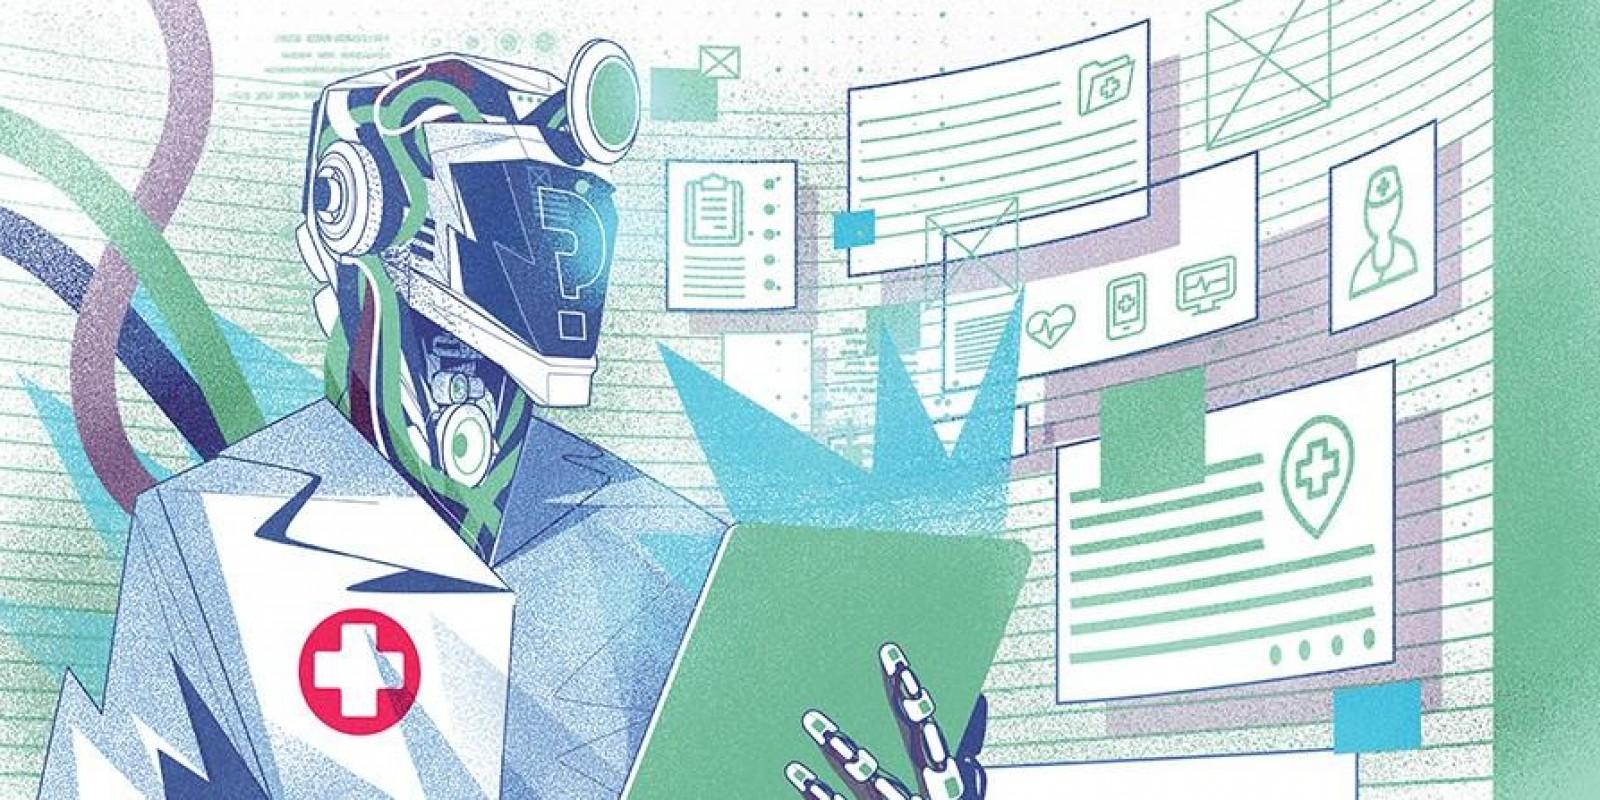 Medicina De Dados: As Promessas (E Os Desafios) Do Big Data Na Saúde